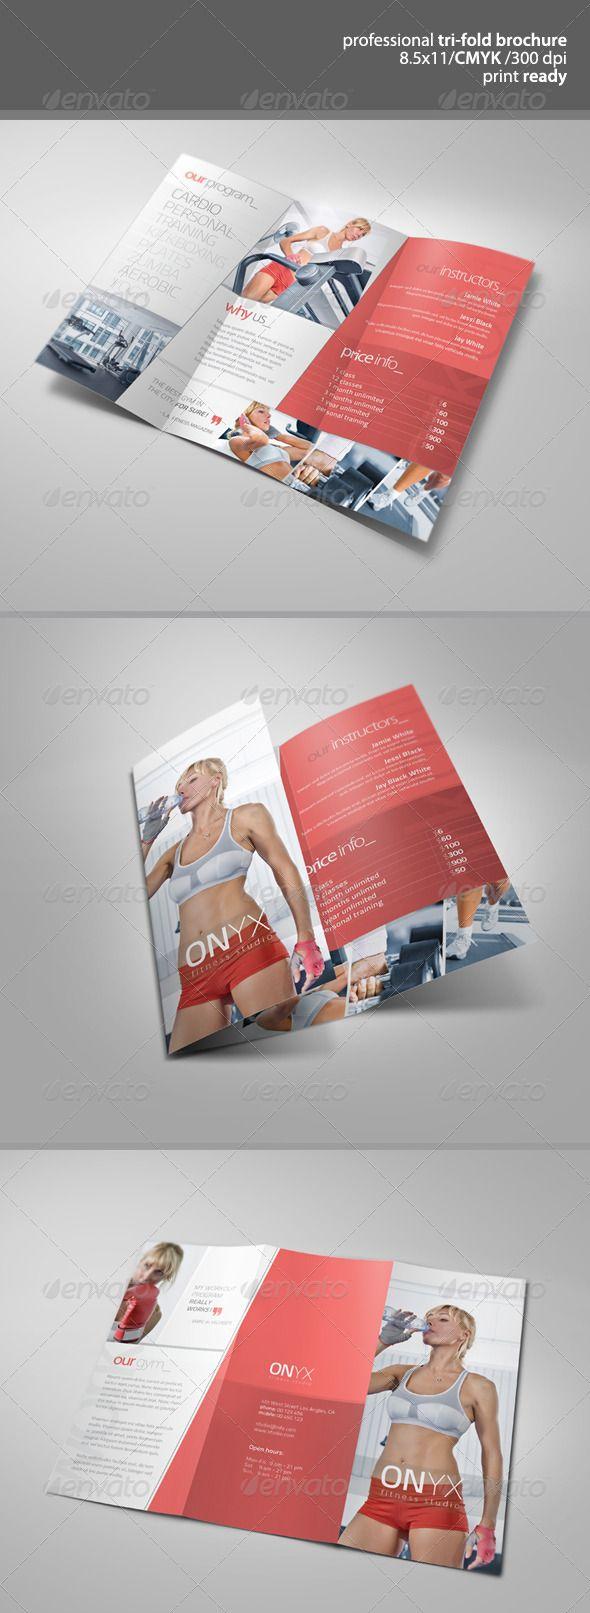 227 best images about 2014 tri fold brochure on pinterest for Fitness brochure design